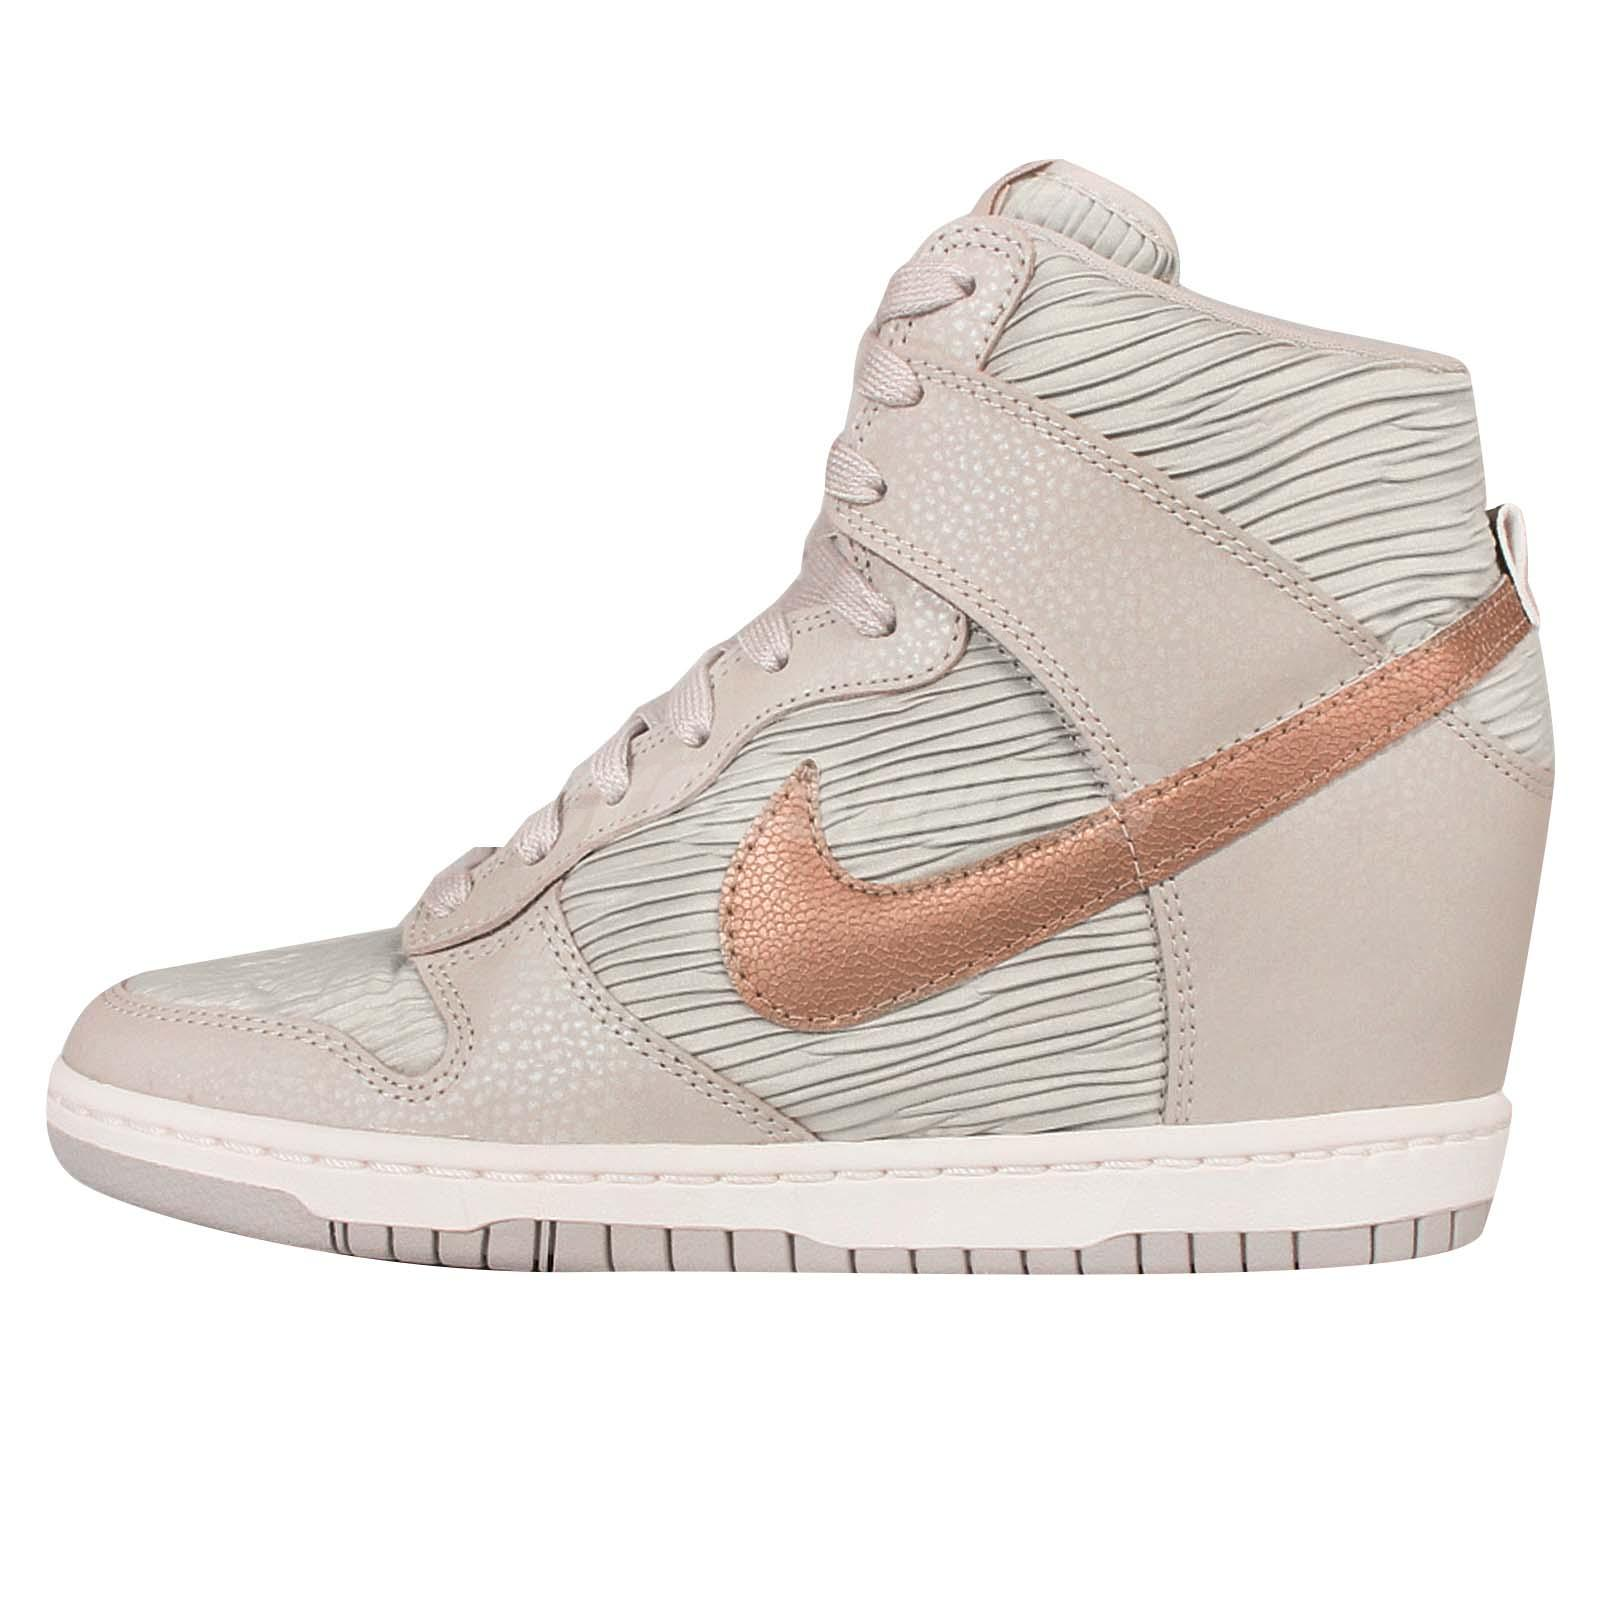 Nike Dunk impressionnismes Sky Hi ChaussuresMusée des impressionnismes Dunk Giverny 3d9d7e